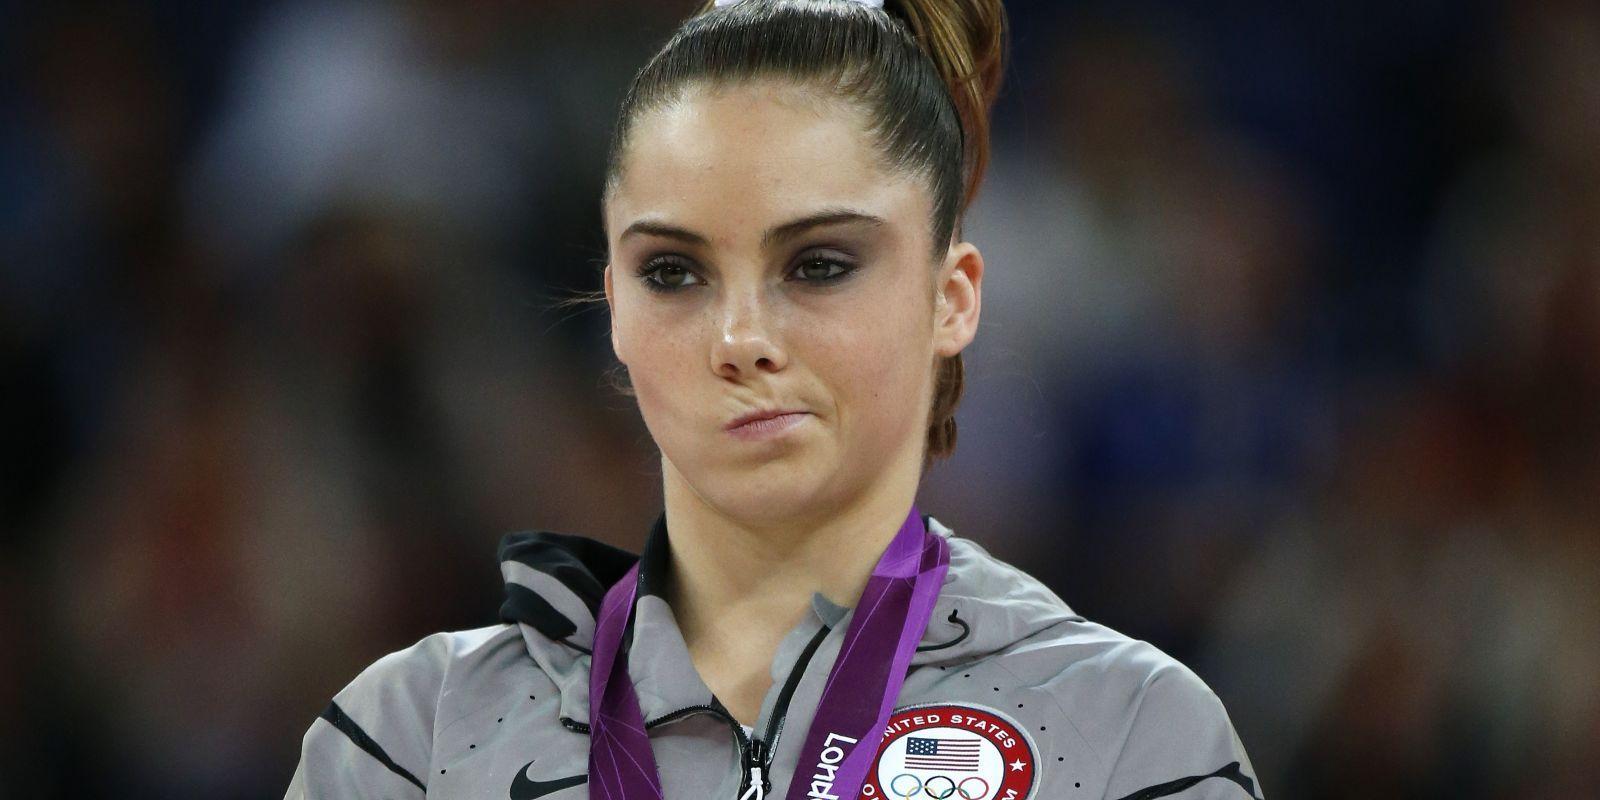 Plummeting Olympics Ratings Are Millennials' Fault Obviously: https://t.co/Yp7GM8CuuA https://t.co/uTa79m7HXQ   https://t.co/4M42sRHVwl